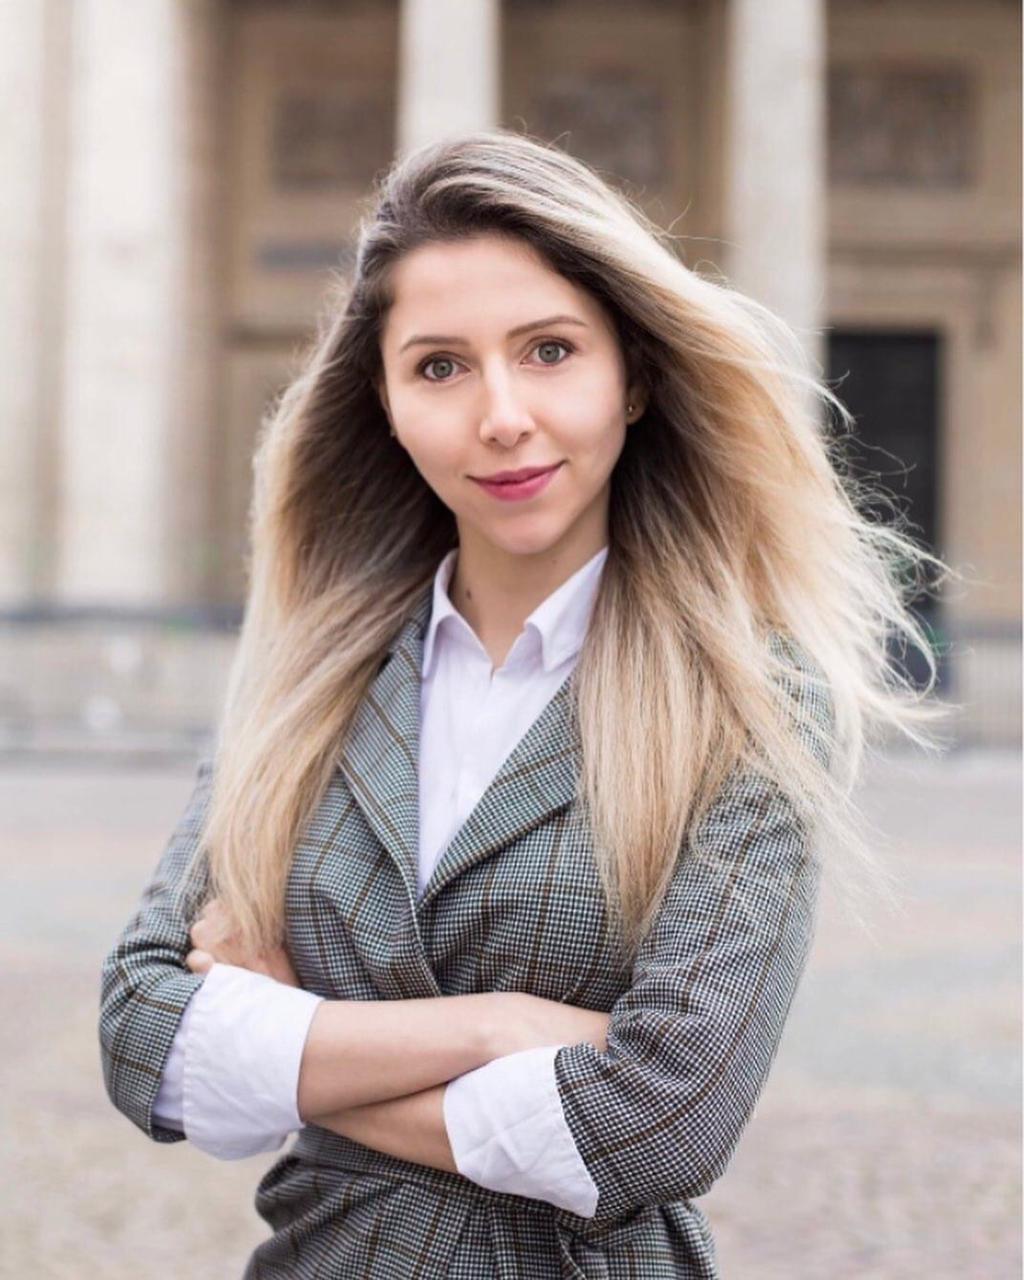 Juliana-Camila BARRERA-PEDRAZA